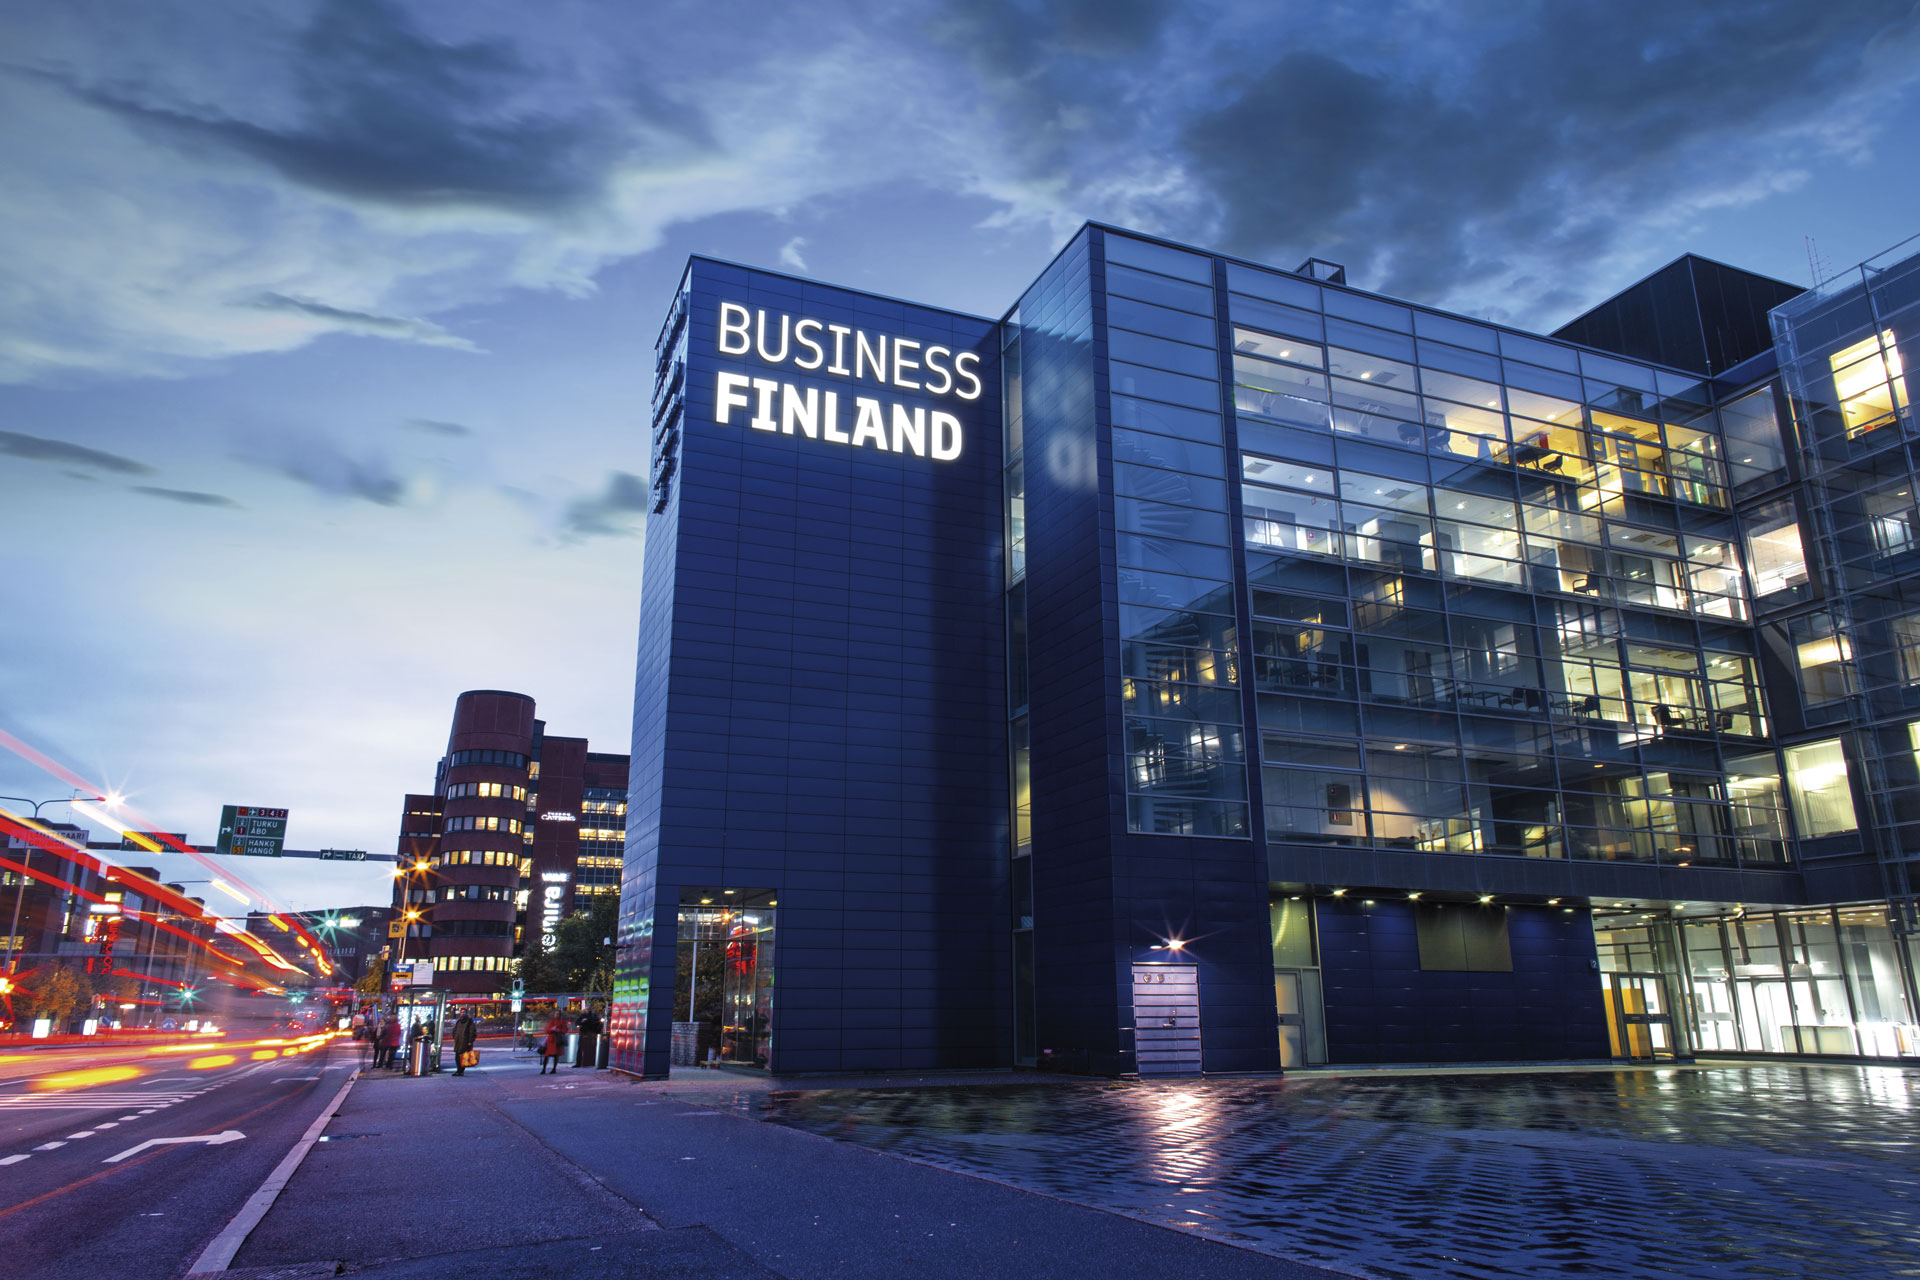 BusinessFinland